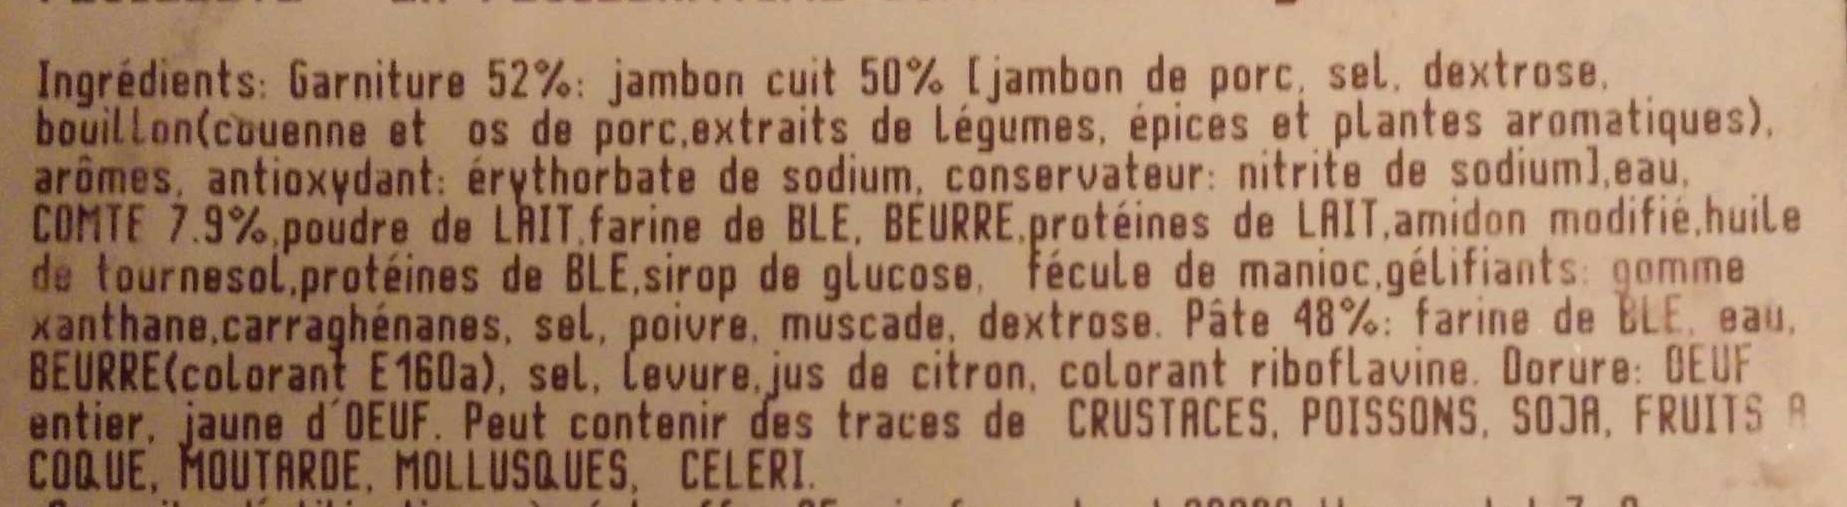 Feuillantine Comtoise - Ingrediënten - fr